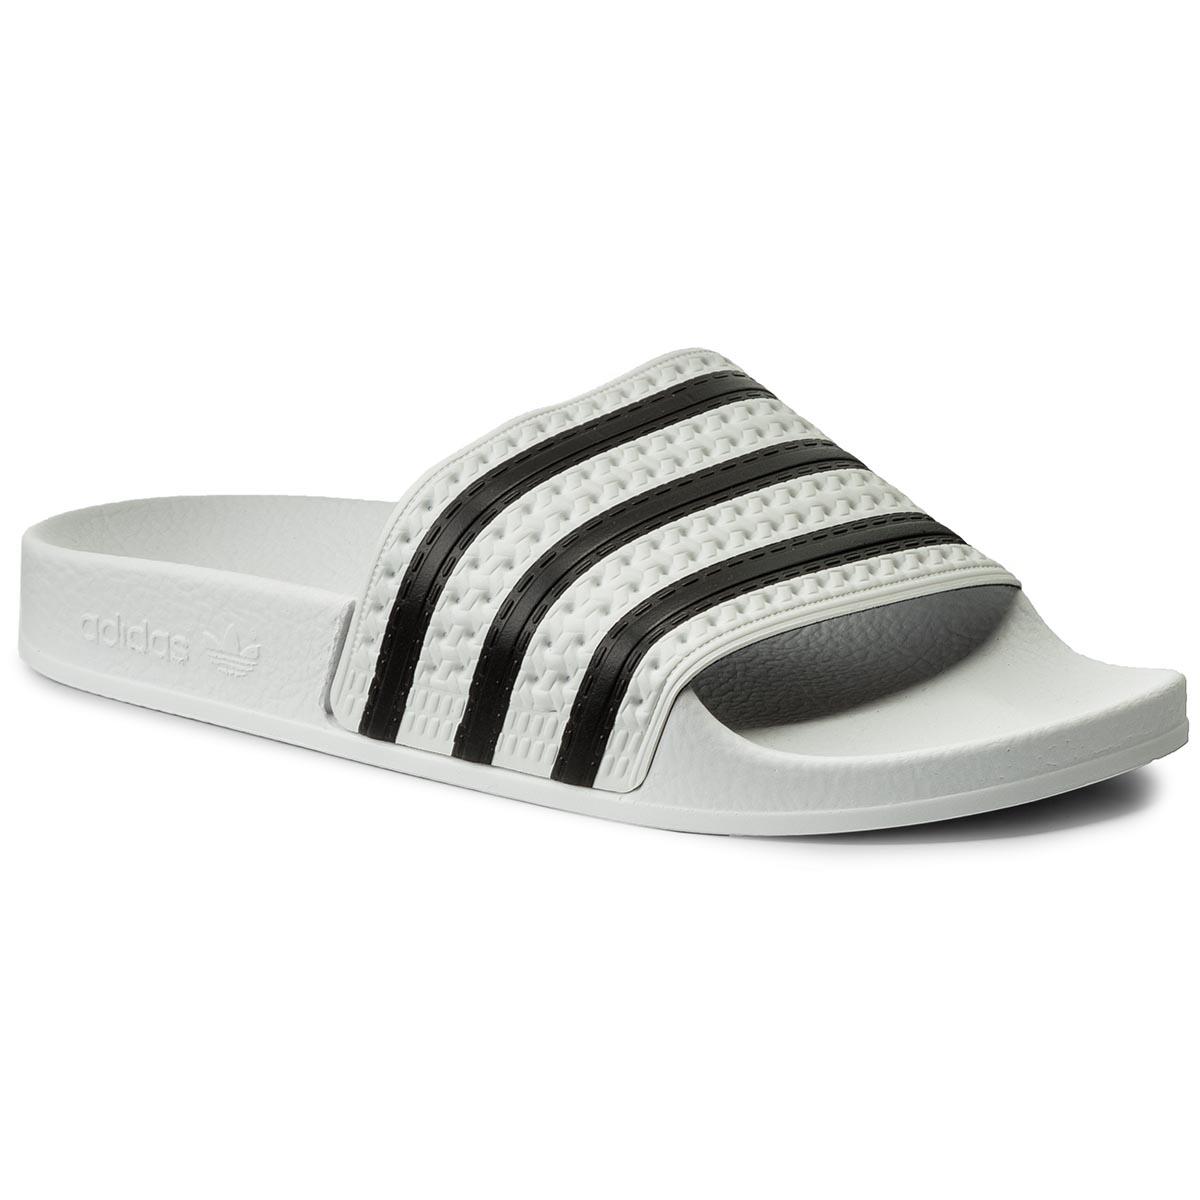 Papucs adidas - adilette 280648 White None White - Glami.hu 27415acf5a